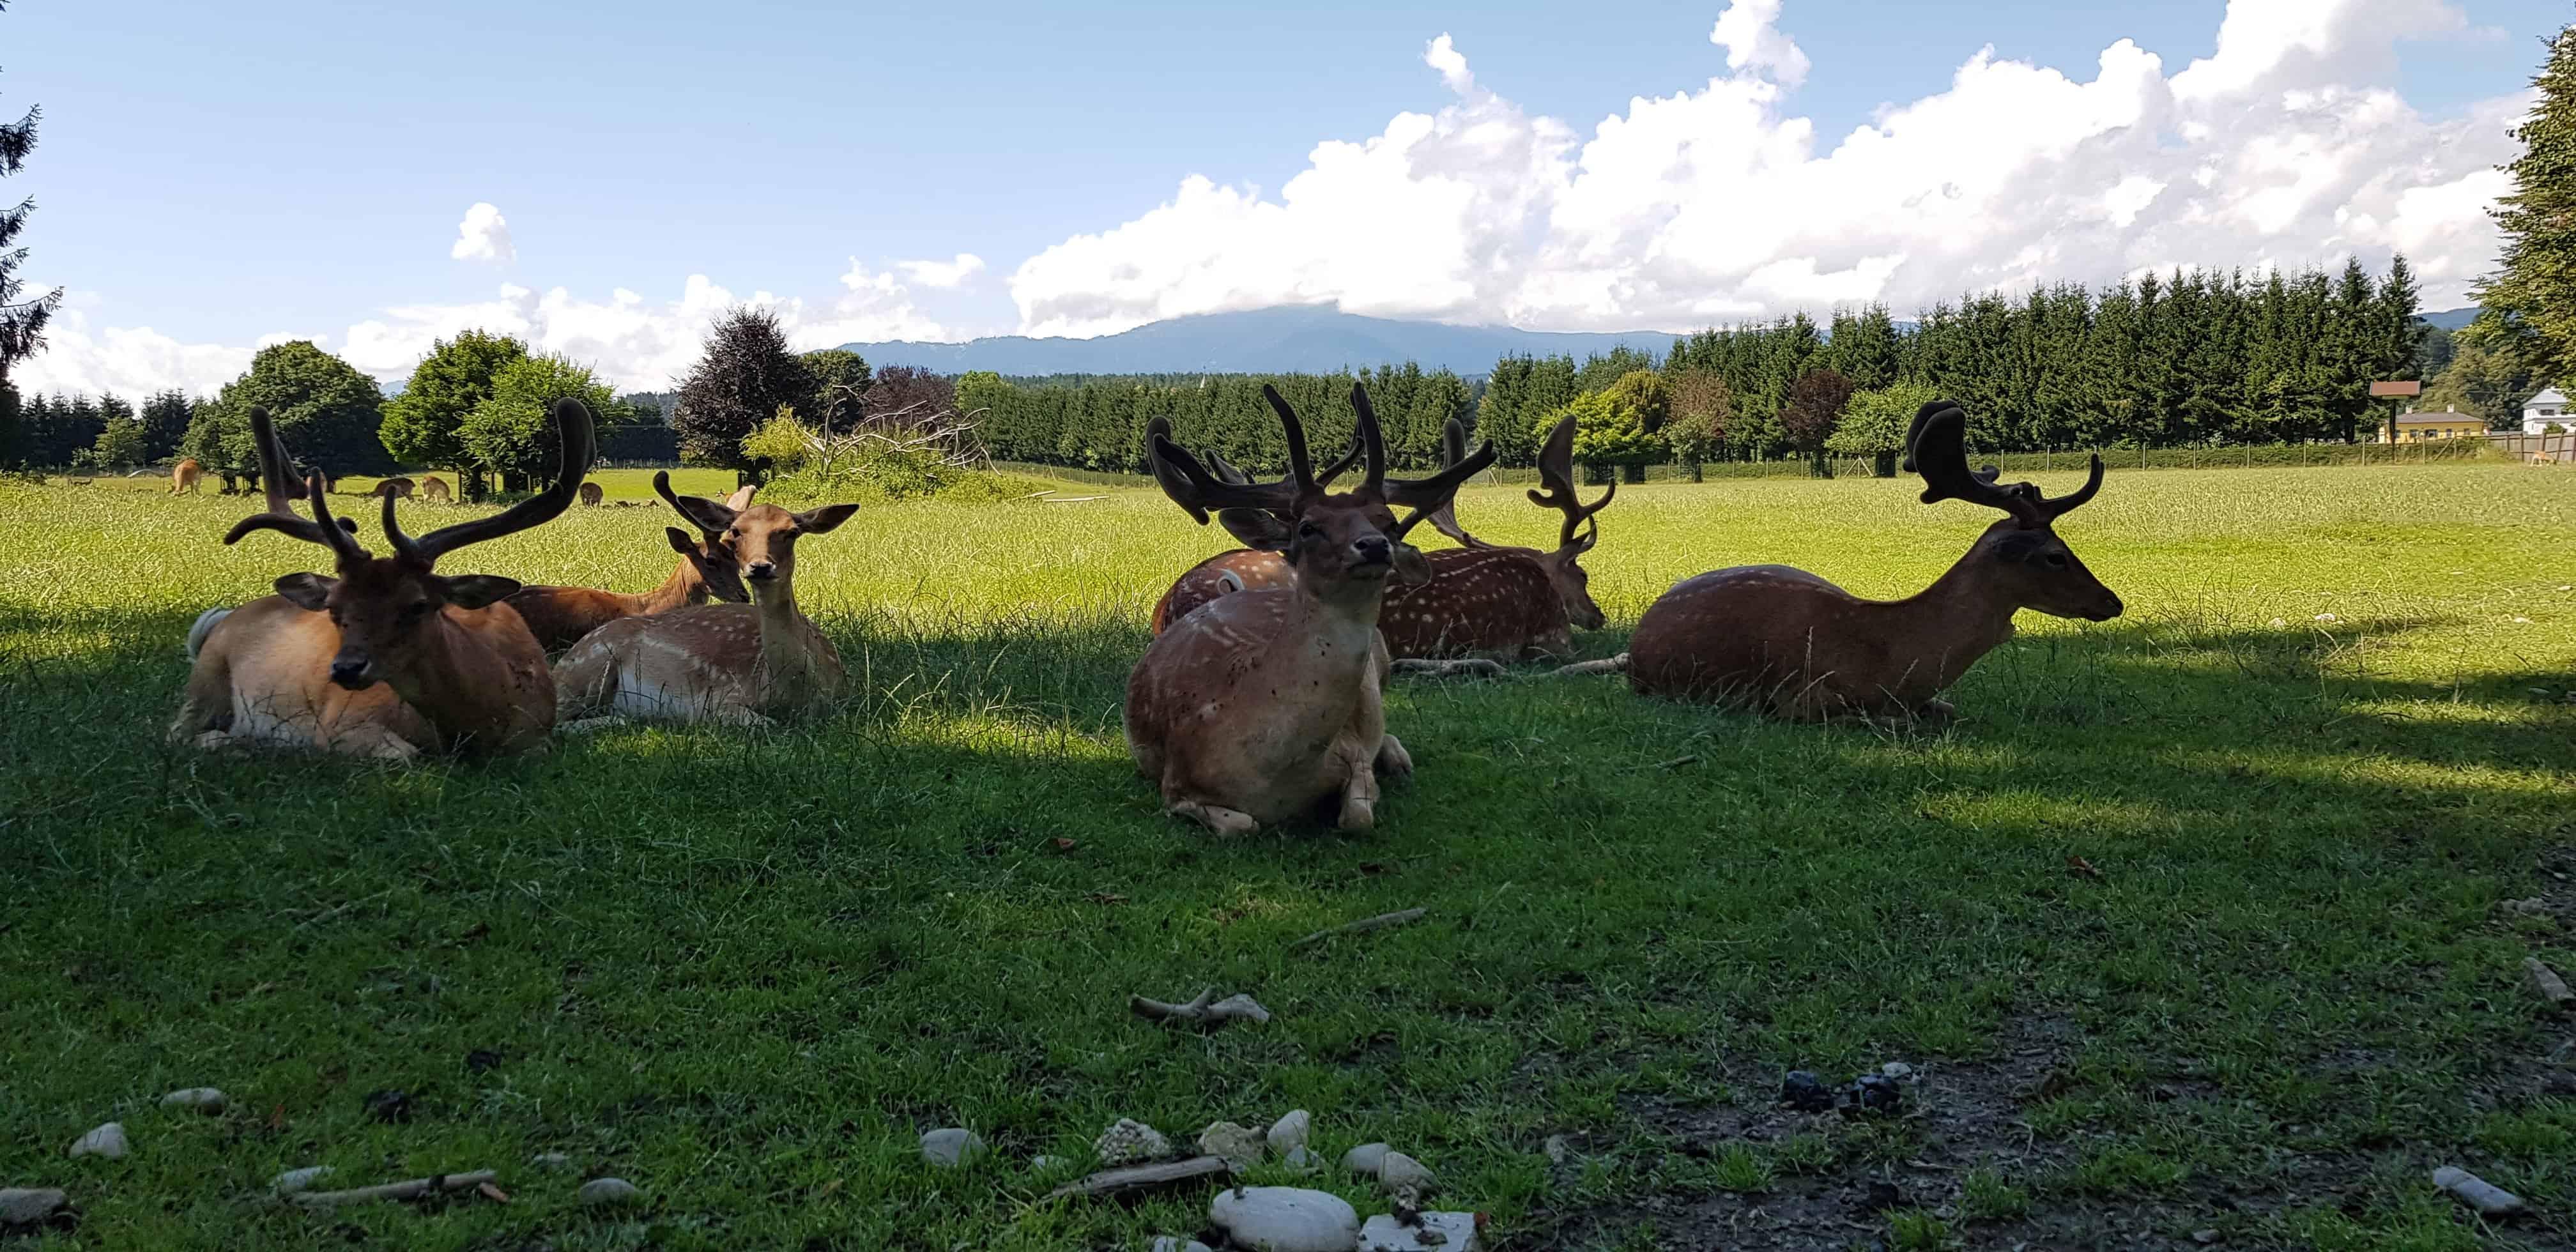 Wild im Wildtierpark Rosegg Kärntens TOP Ausflugsziele